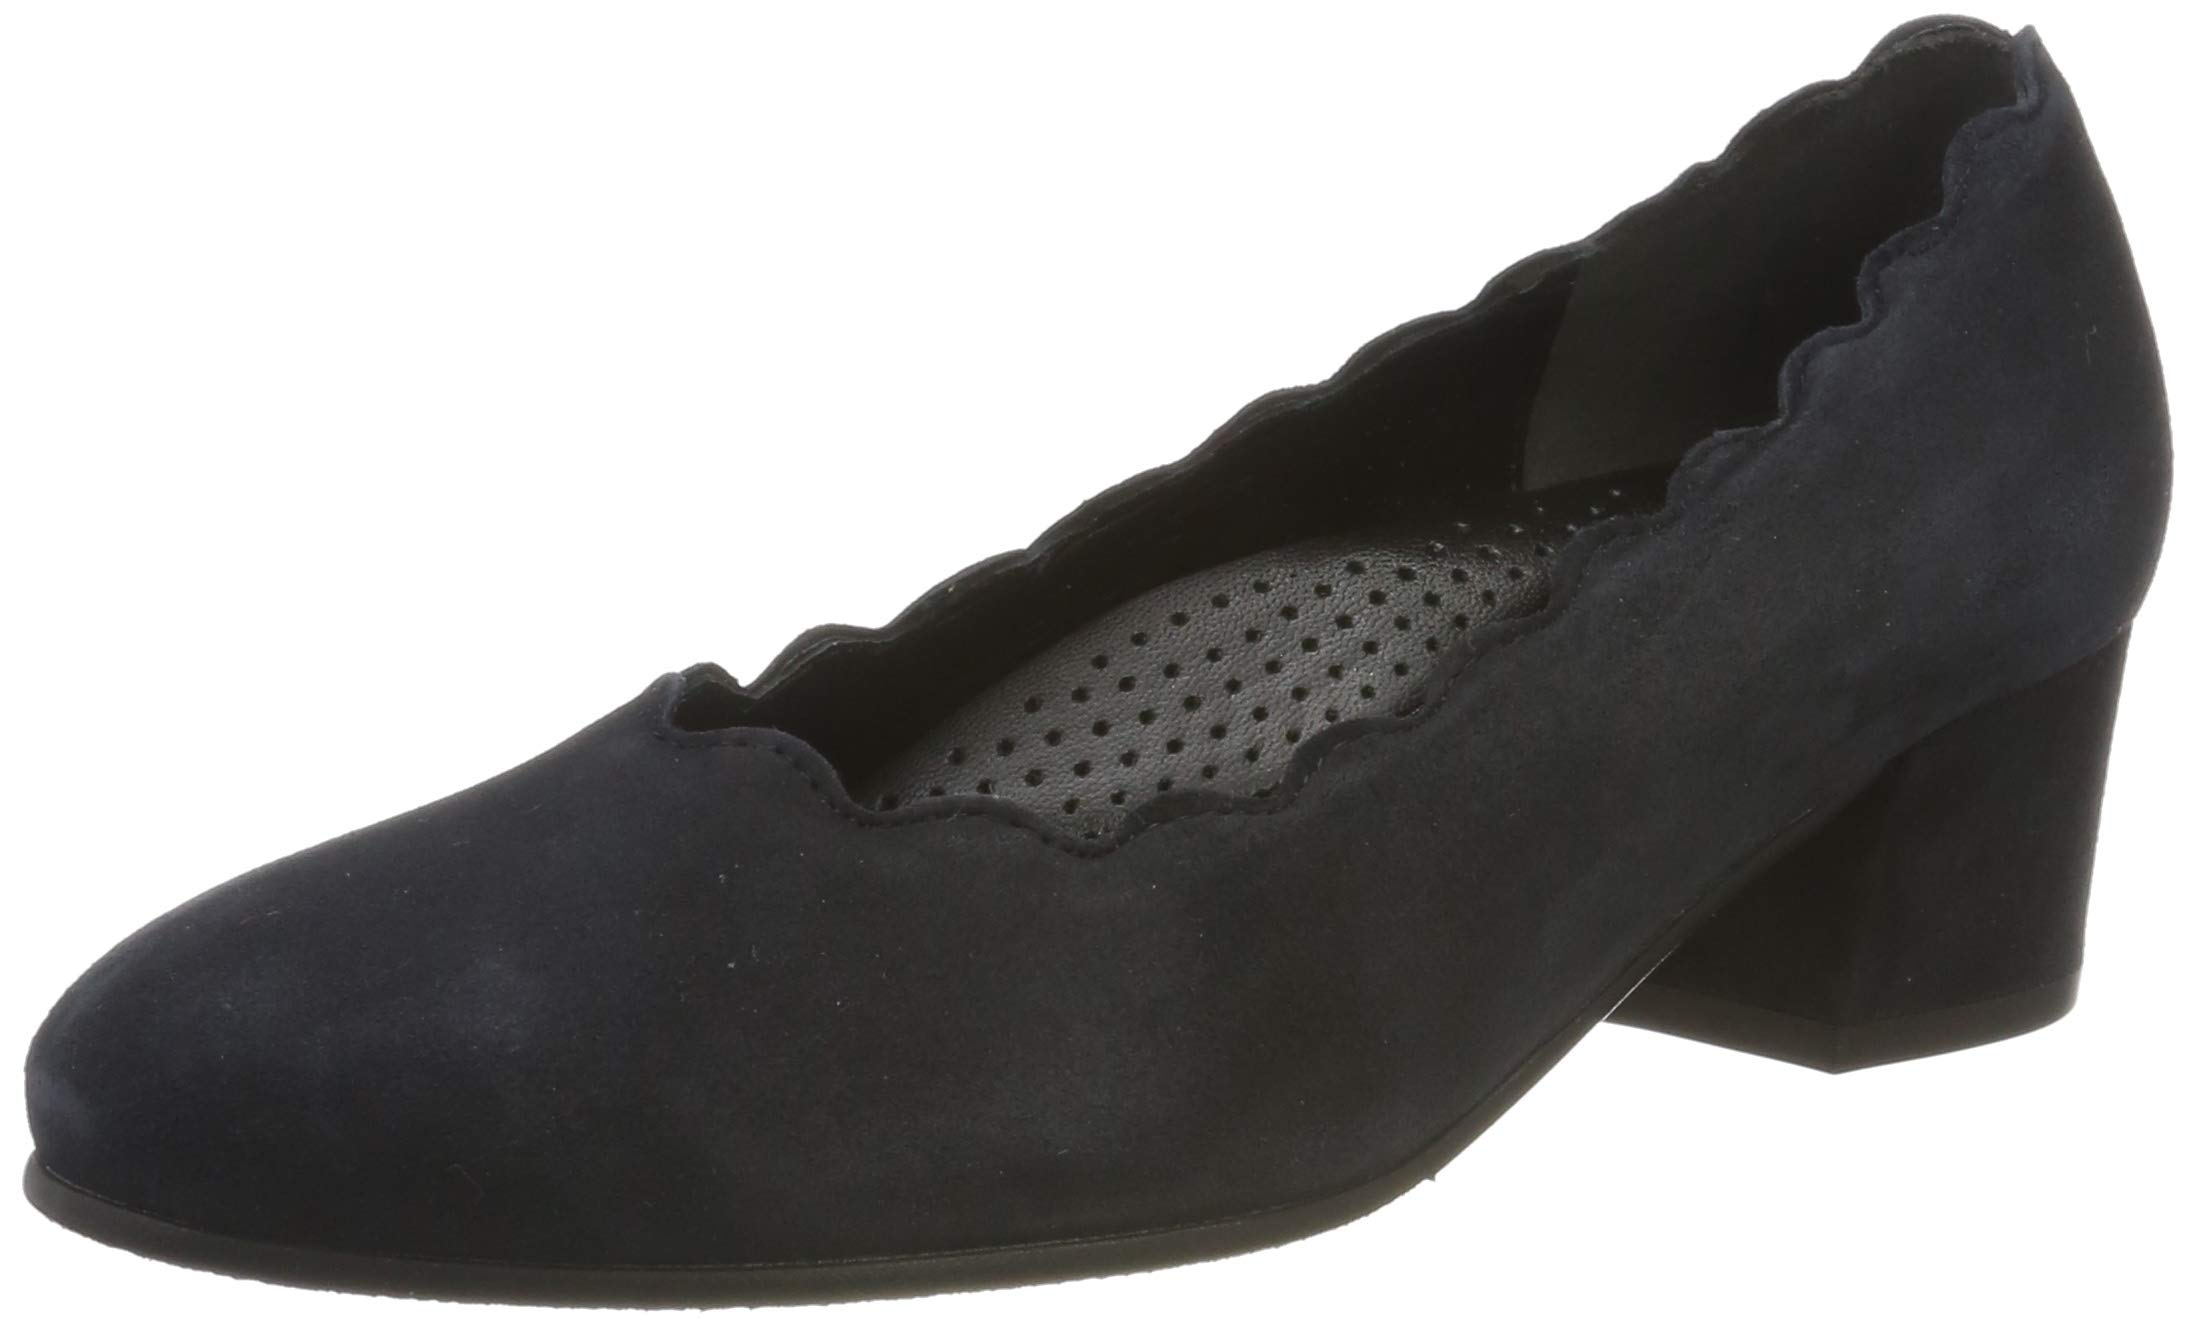 Comfort FashionEscarpins FemmeBleupazifika Gabor Shoes obl2635 Eu ymn0wvN8O